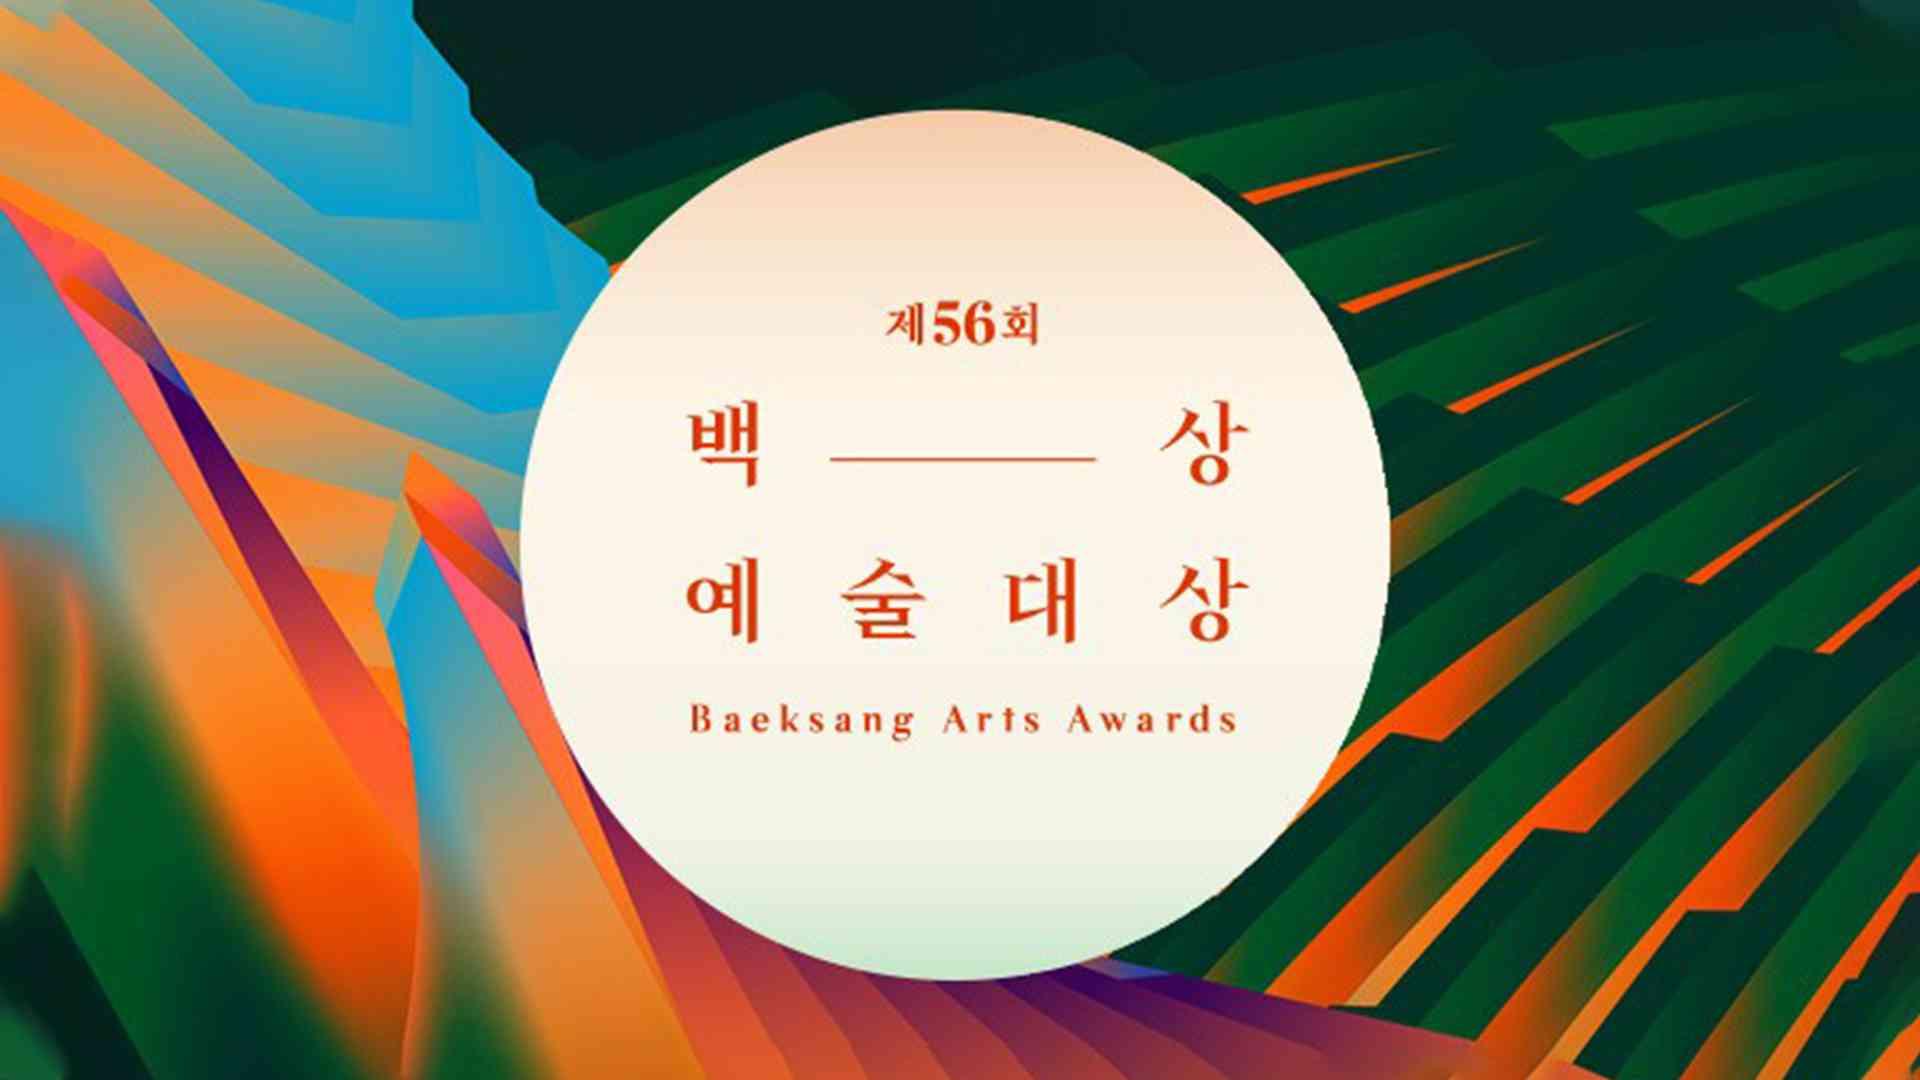 Daftar Para Pemenang Baeksang Arts Awards ke-56